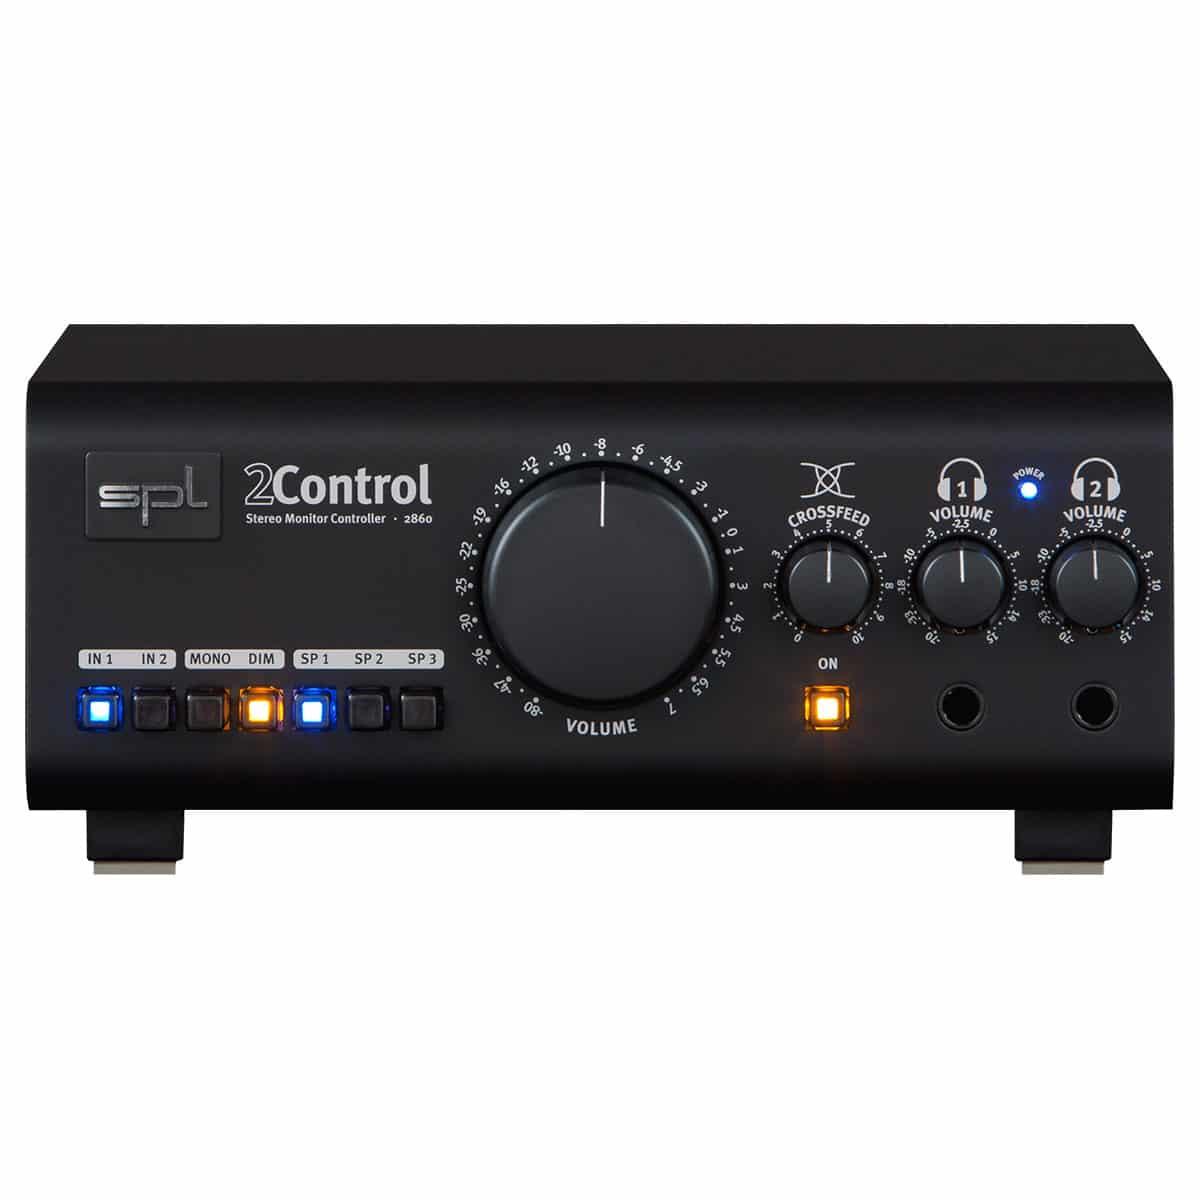 SPL 2 Control 06 SPL 2 Control